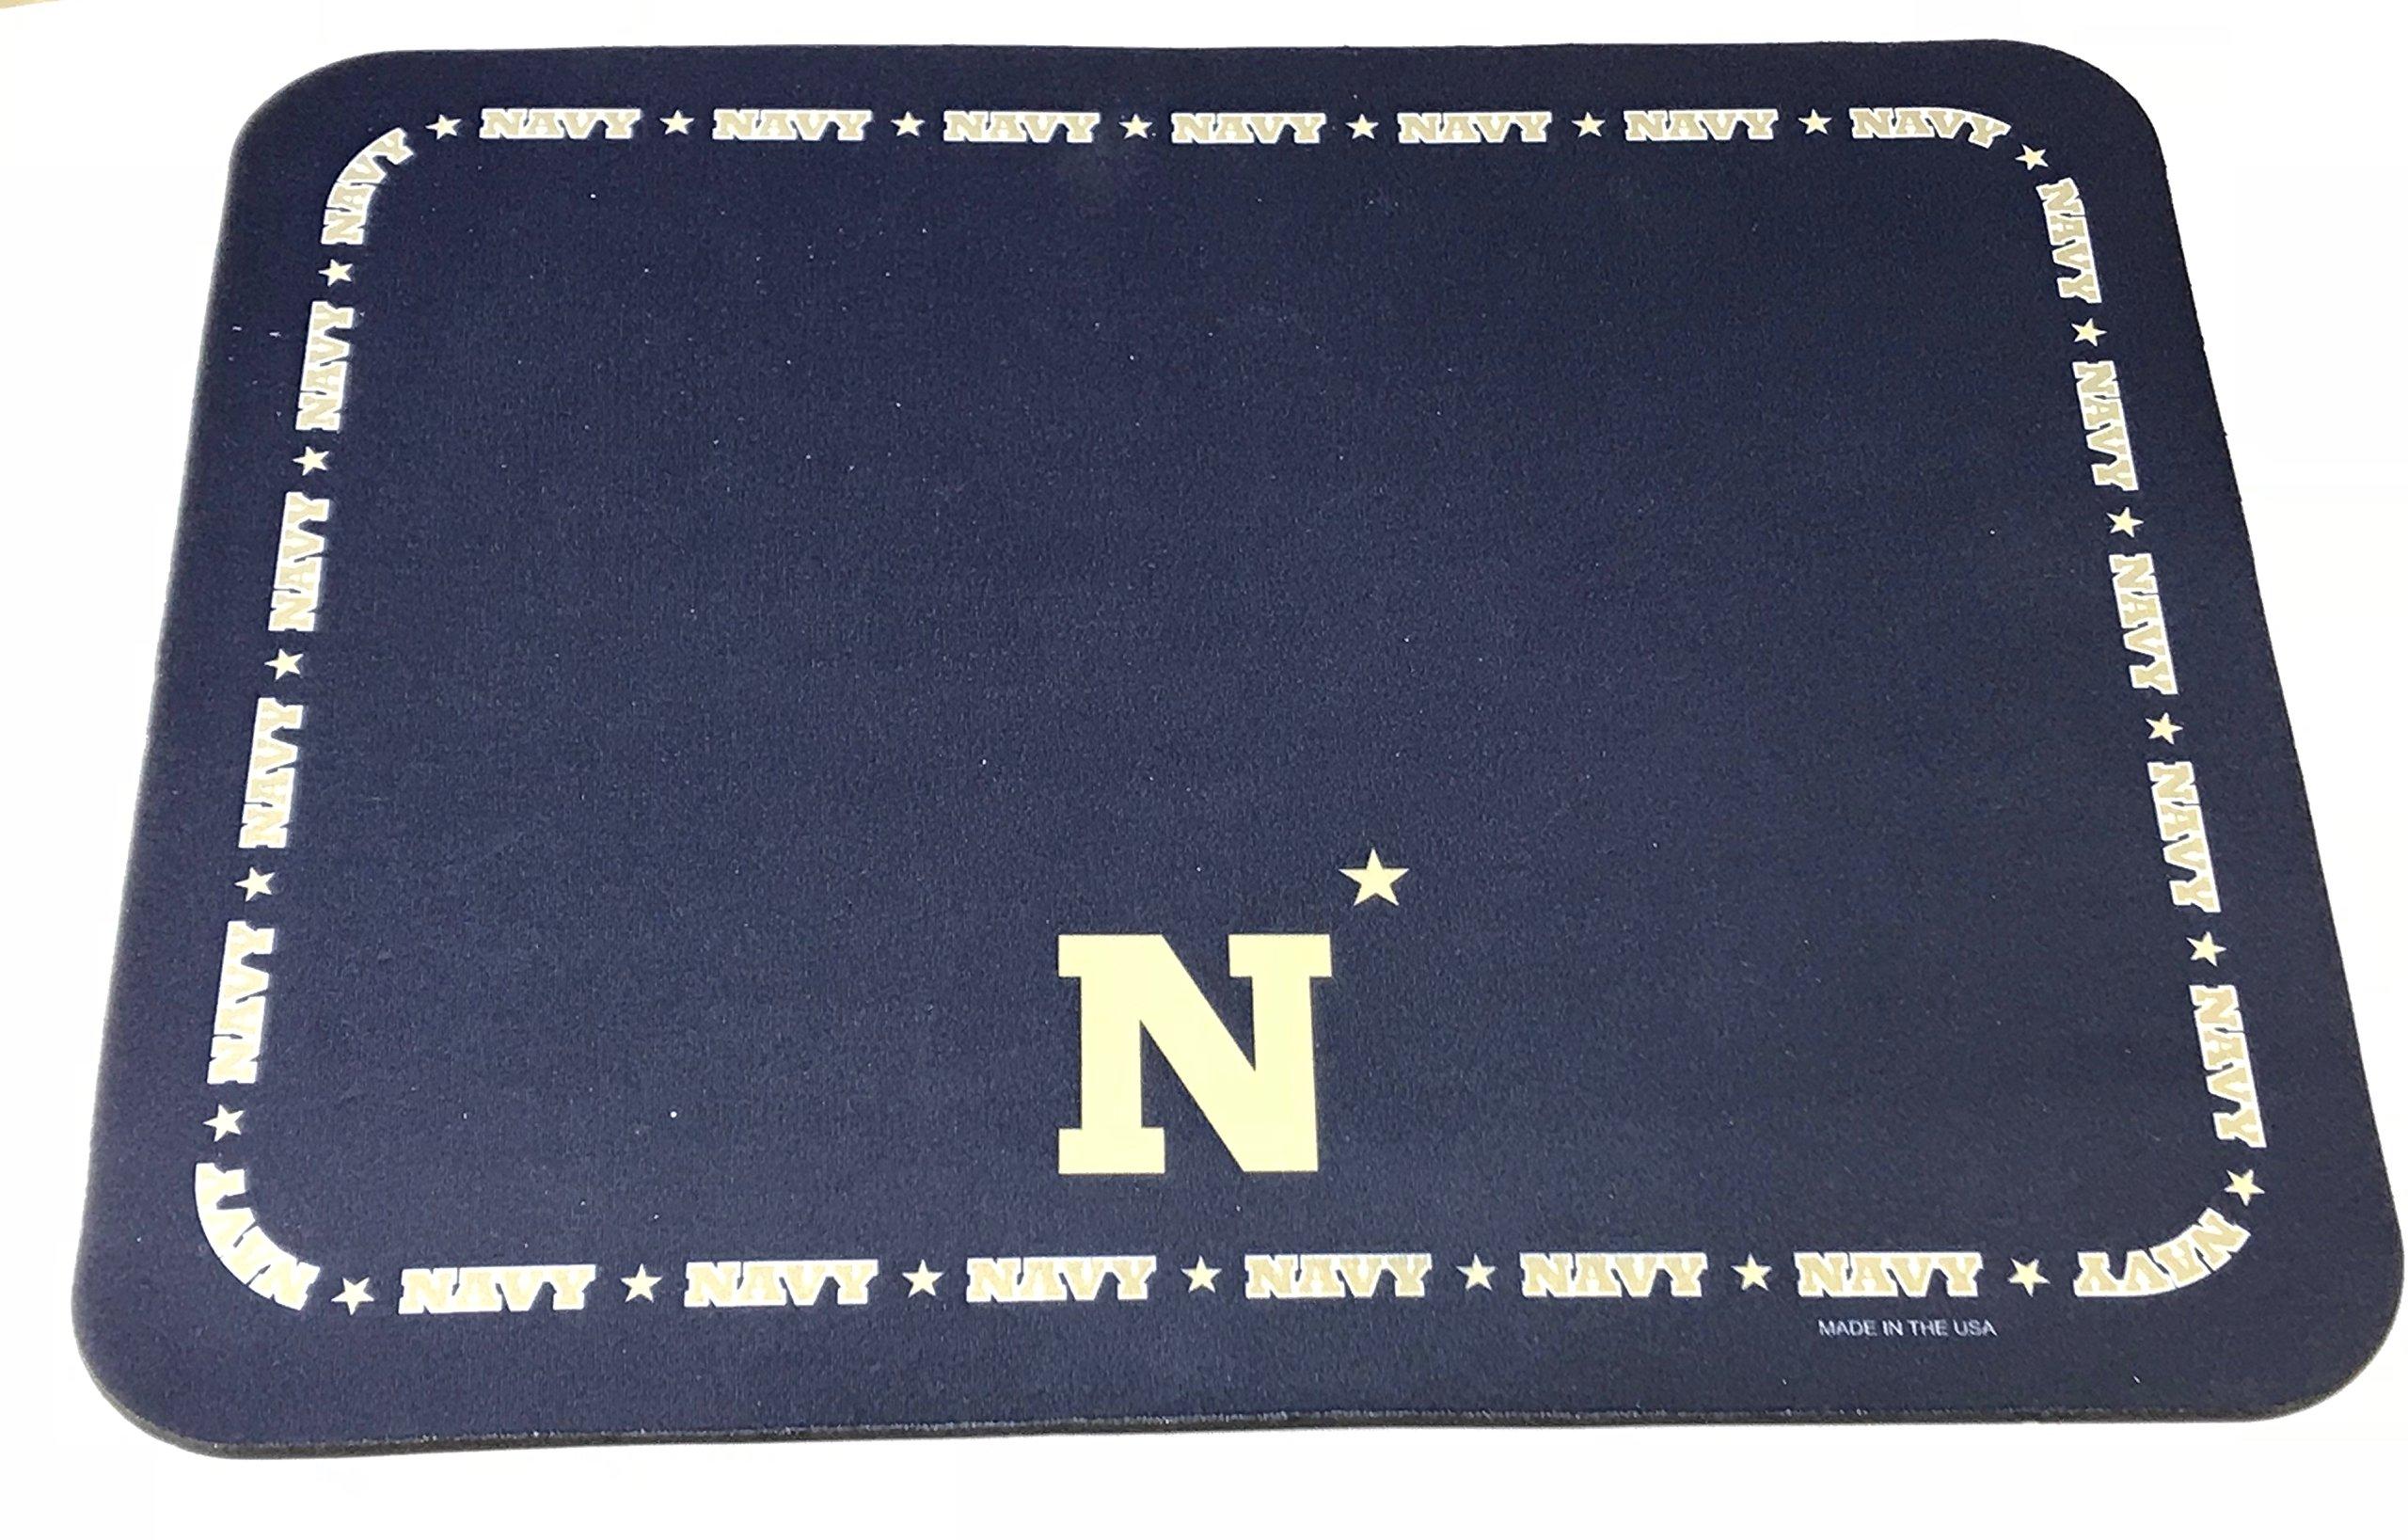 NCAA Collegiate Placemats - Navy - Set of 4